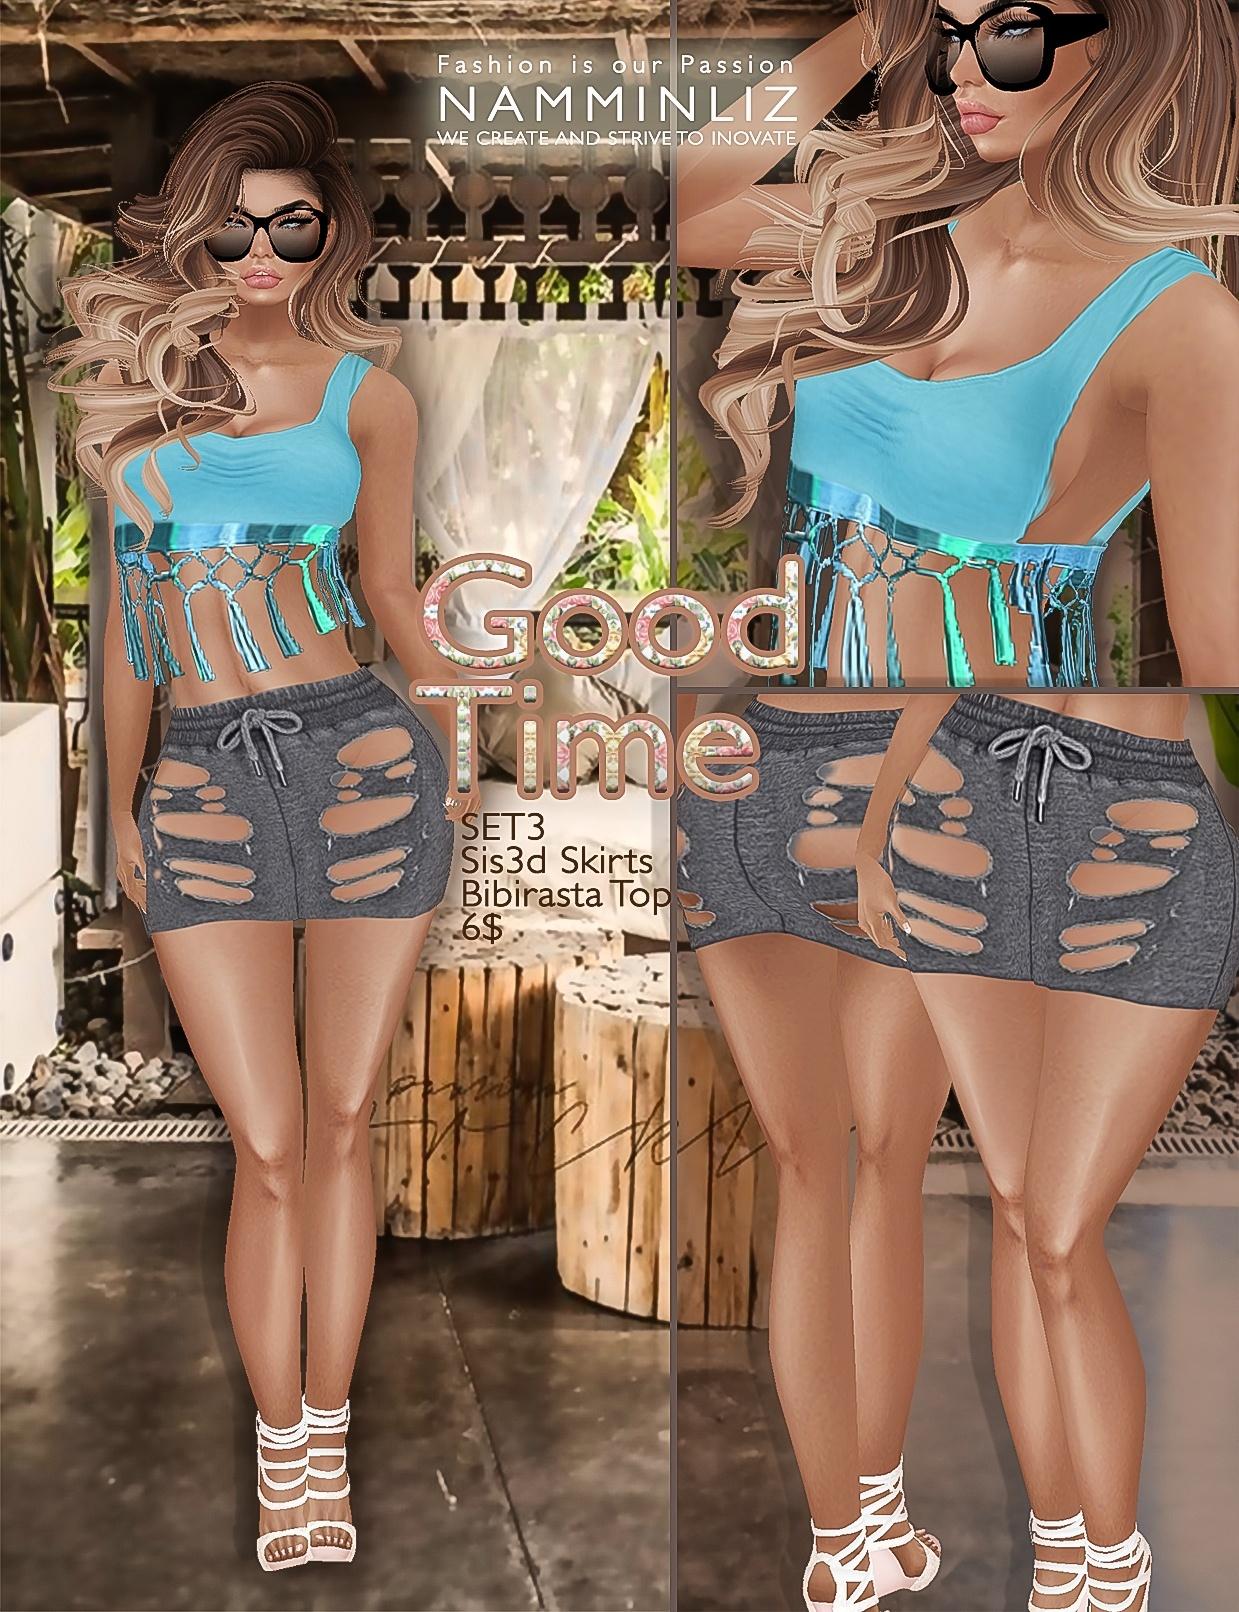 Good time SET3 •Sis3d skirt •Bibirasta top imvu texture PNG